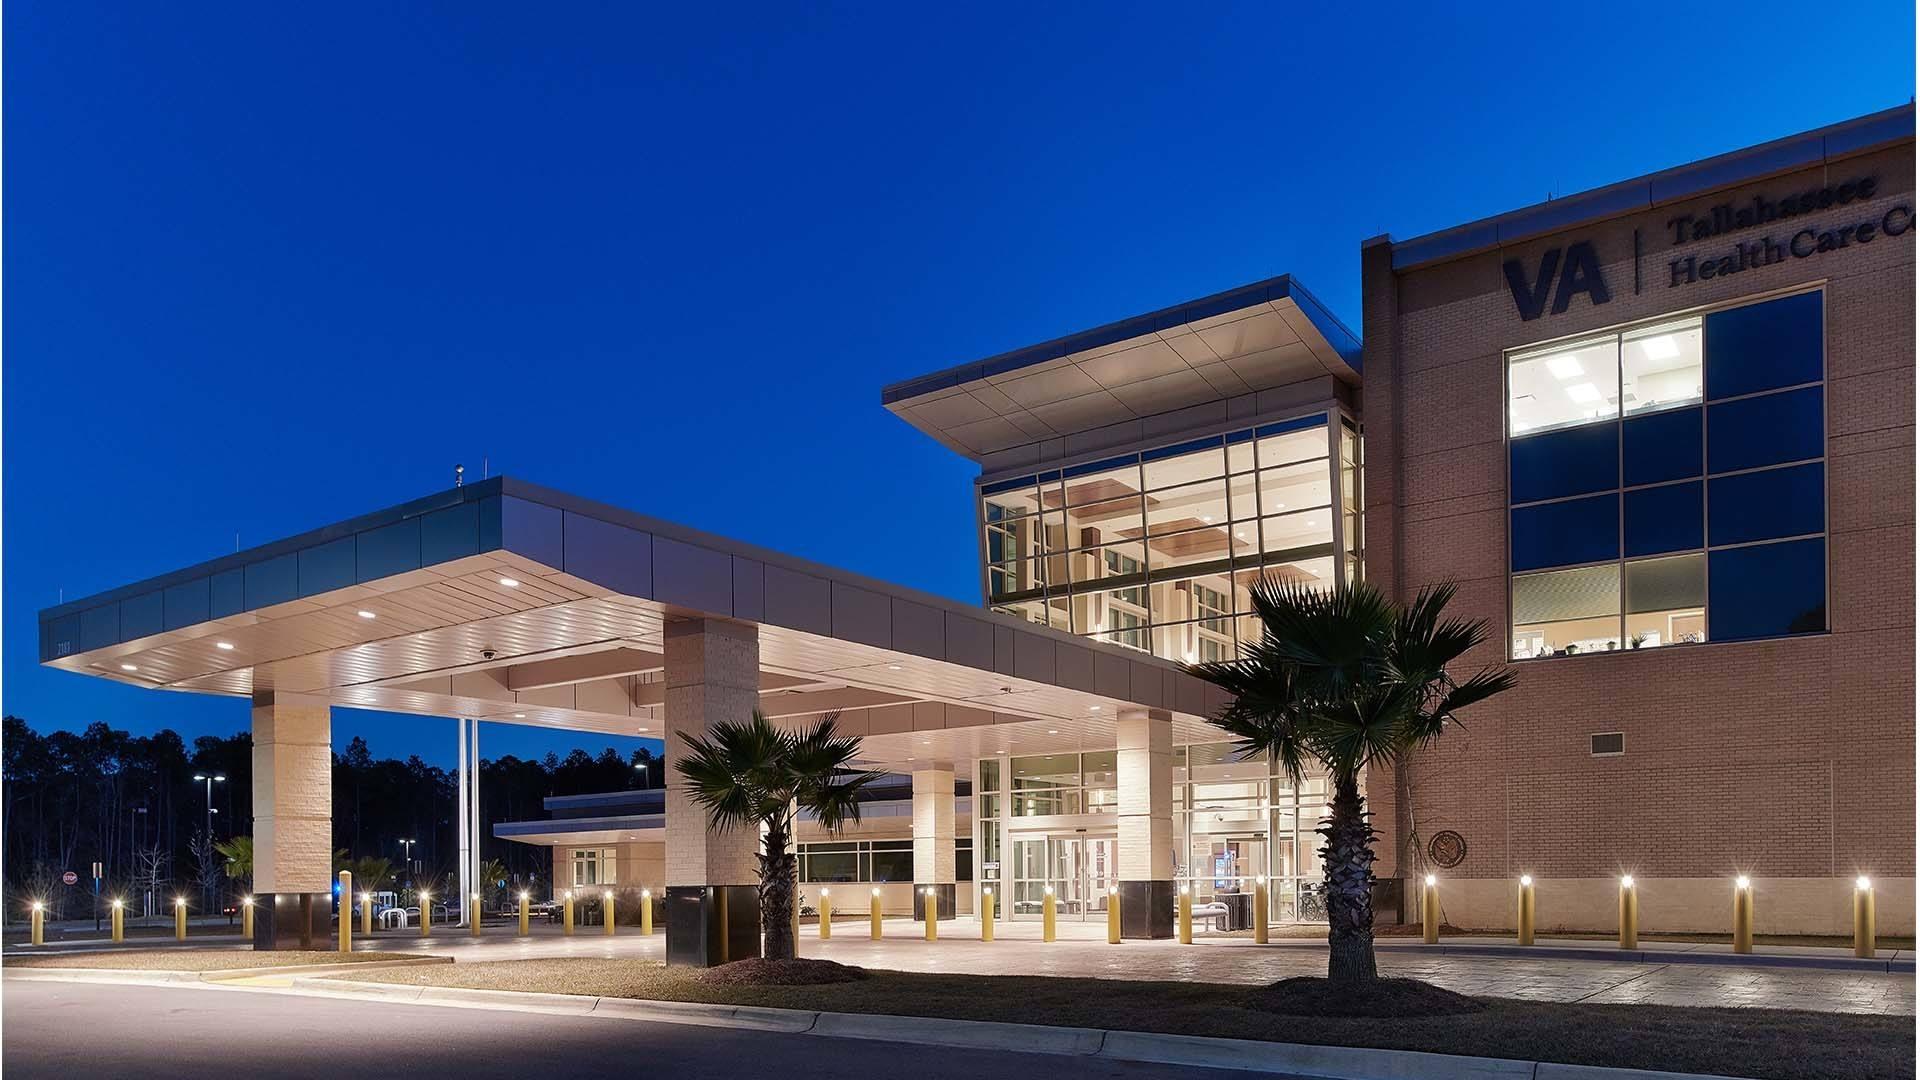 VA Tallahassee Front Exterior